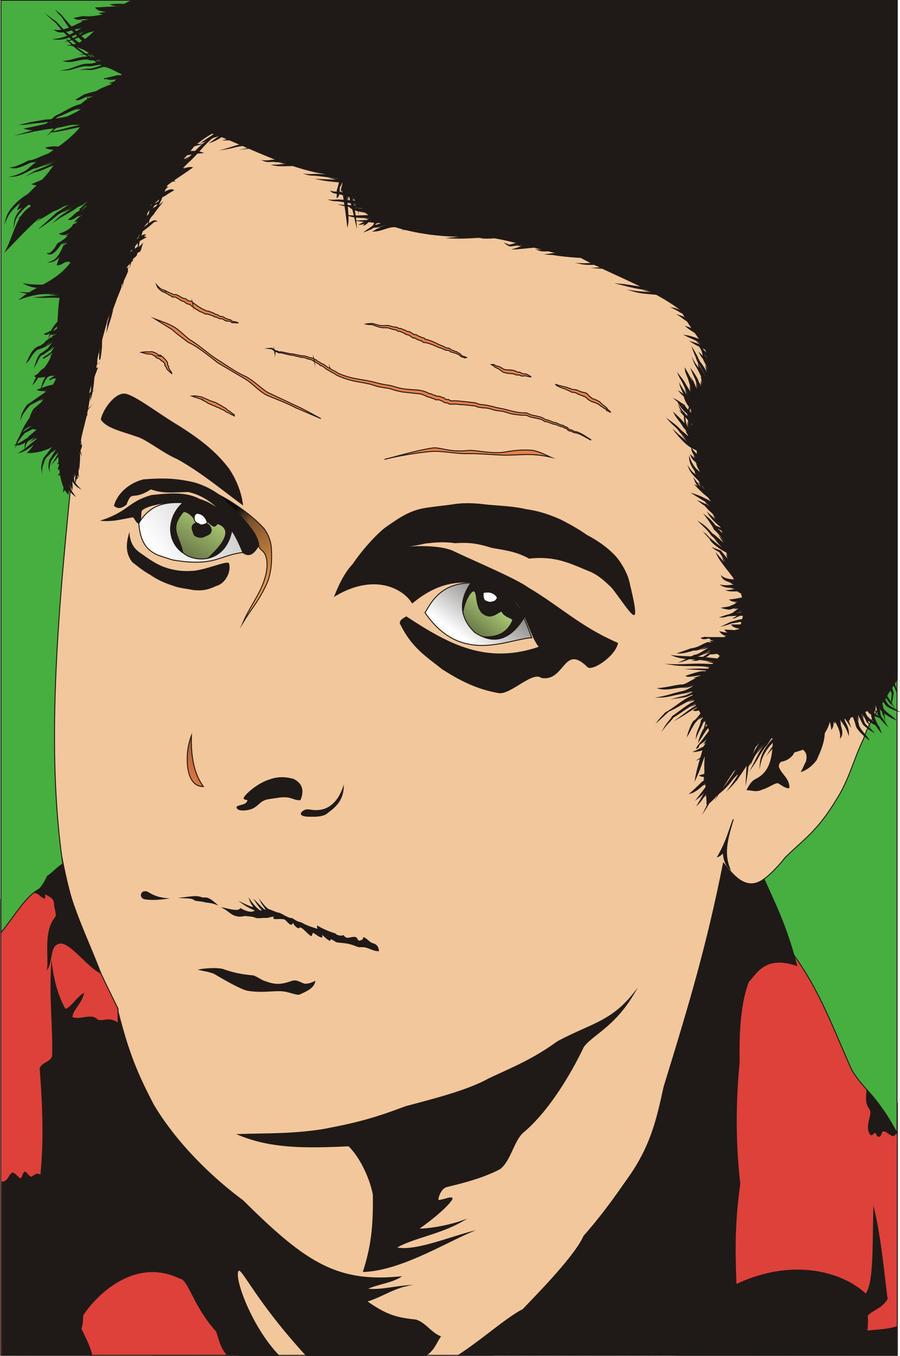 Billie Joe Armstrong by Zheptyndaroe